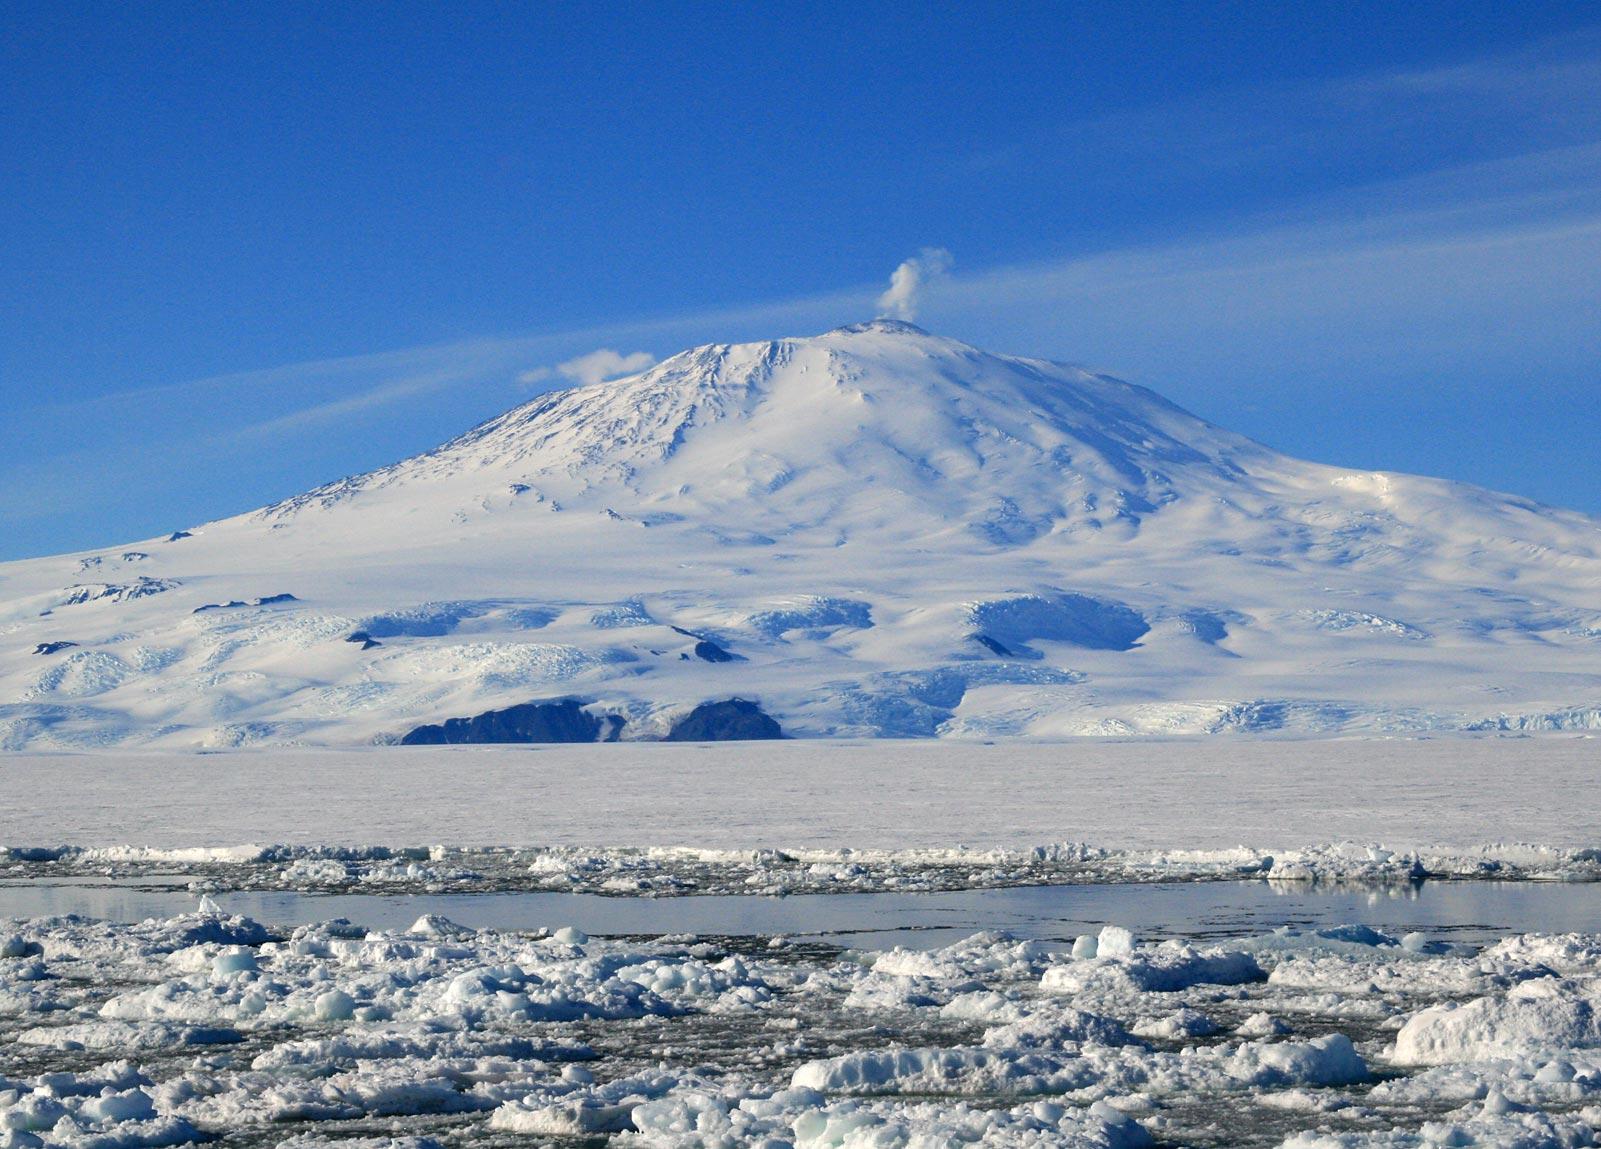 фото 4 вулканы